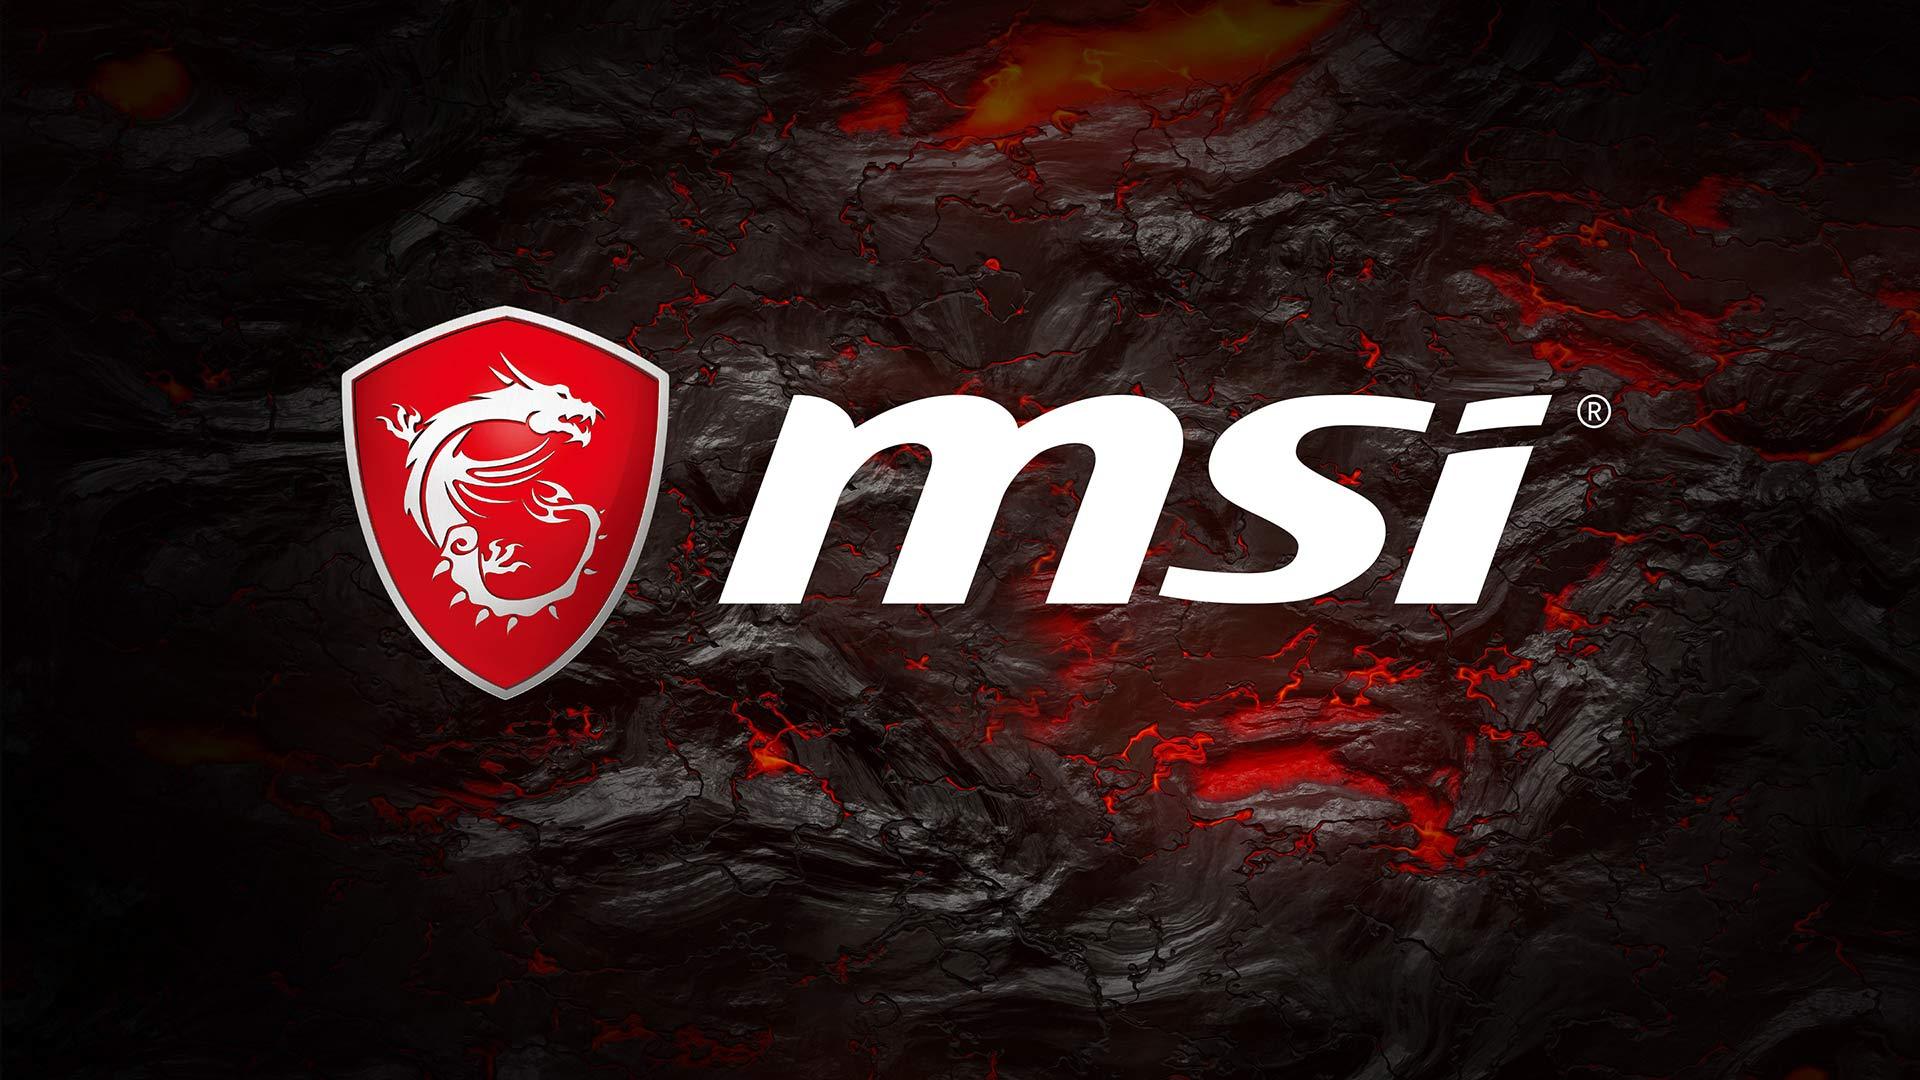 Msi Logo Wallpapers Top Free Msi Logo Backgrounds